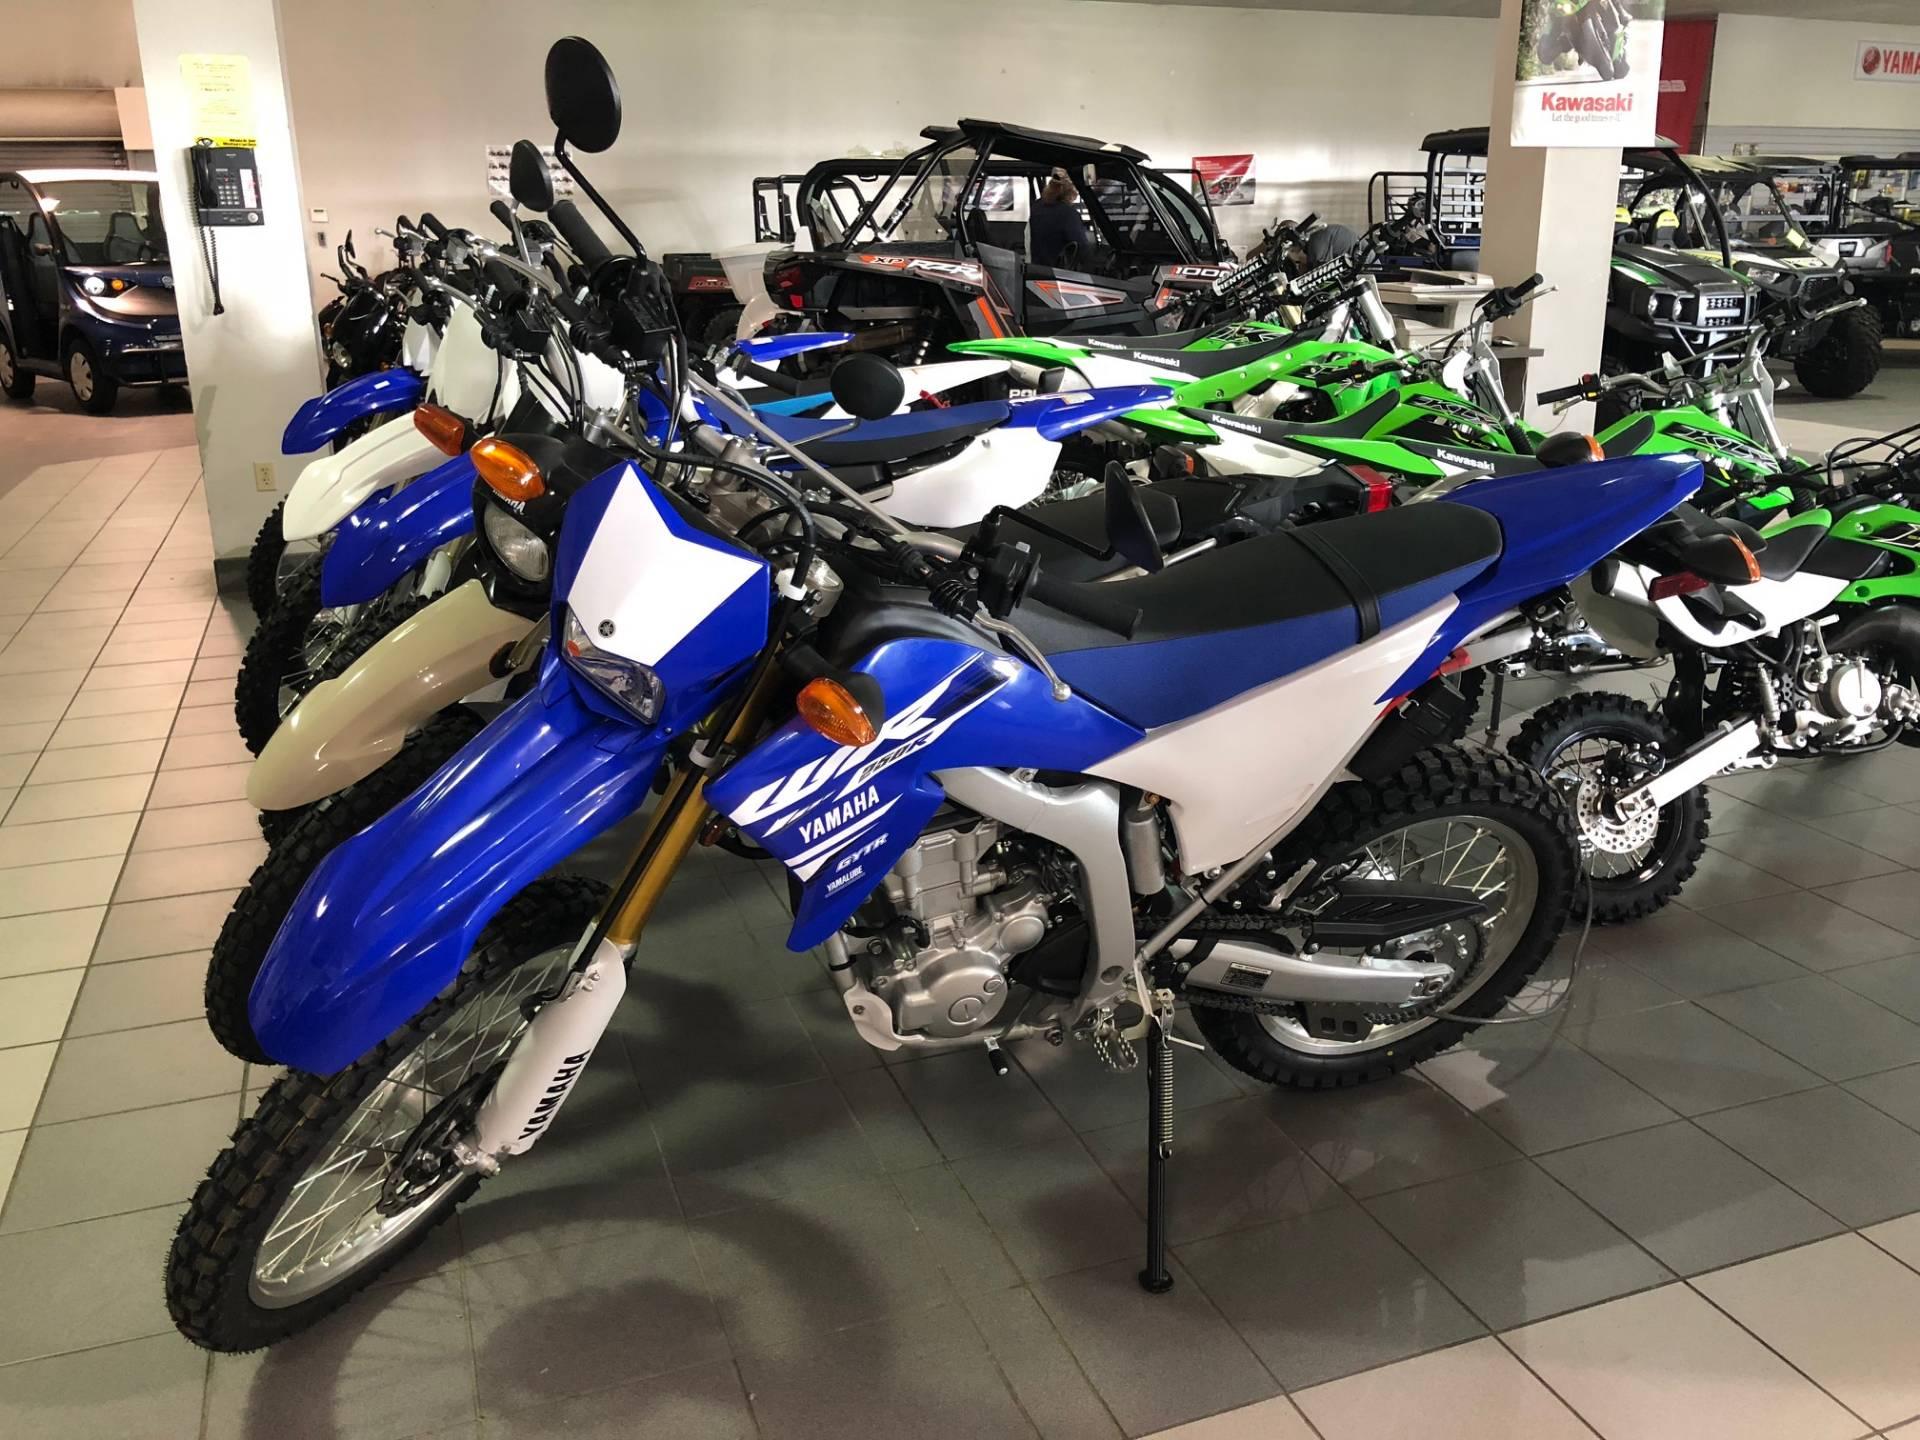 2018 Yamaha WR250R for sale 4564